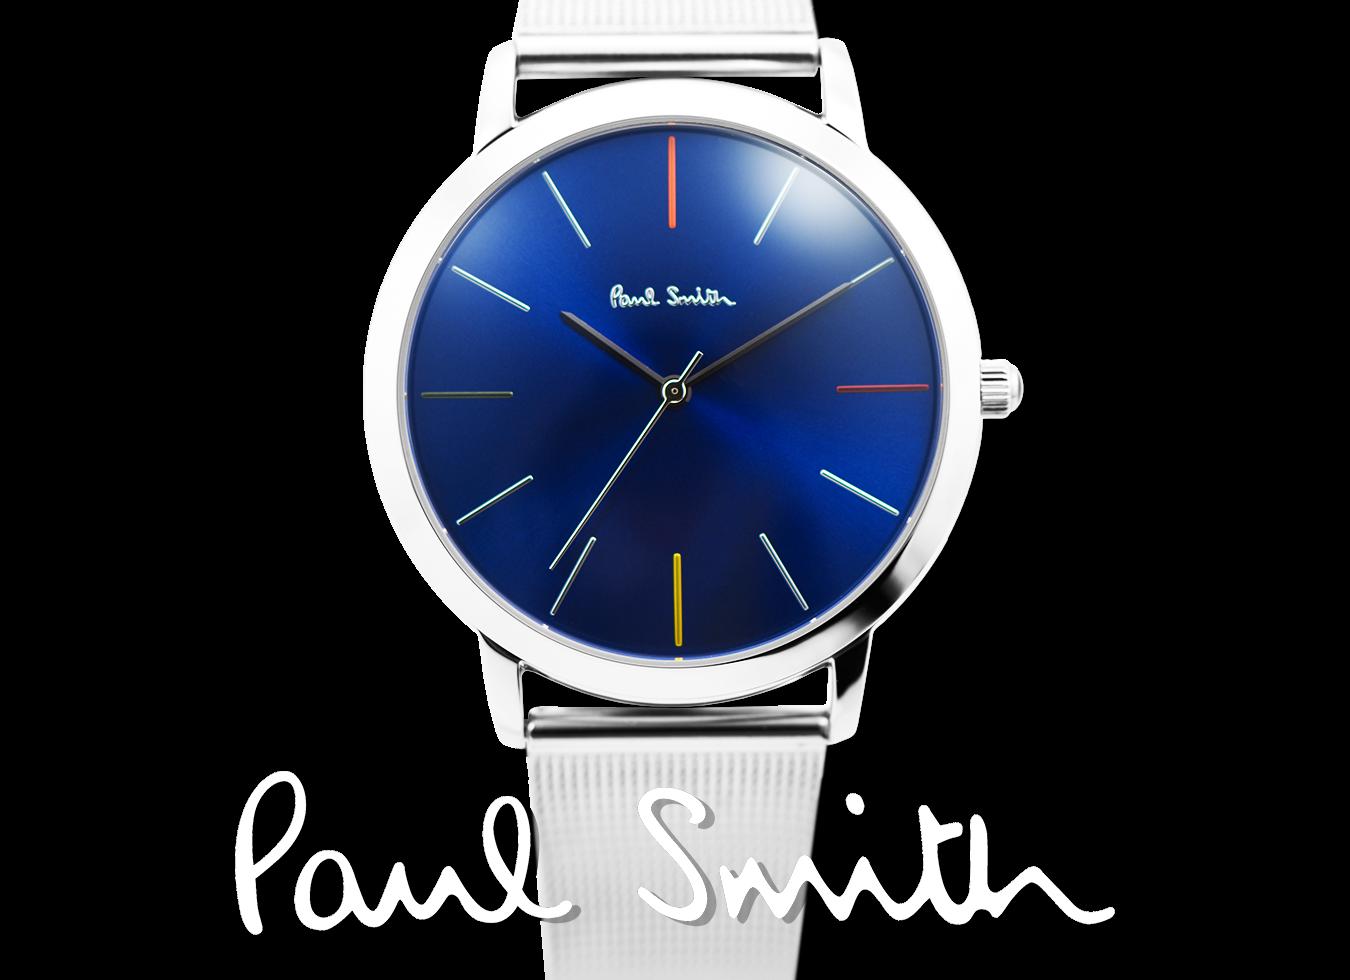 separation shoes 7ff2f a0766 Paul Smith ポールスミス MA エムエー 41mm メンズ 腕時計 レザー メタル ウォッチ プレゼント 贈り物 記念日 ギフト  [あす楽]|セレクトショップ NUMBER11